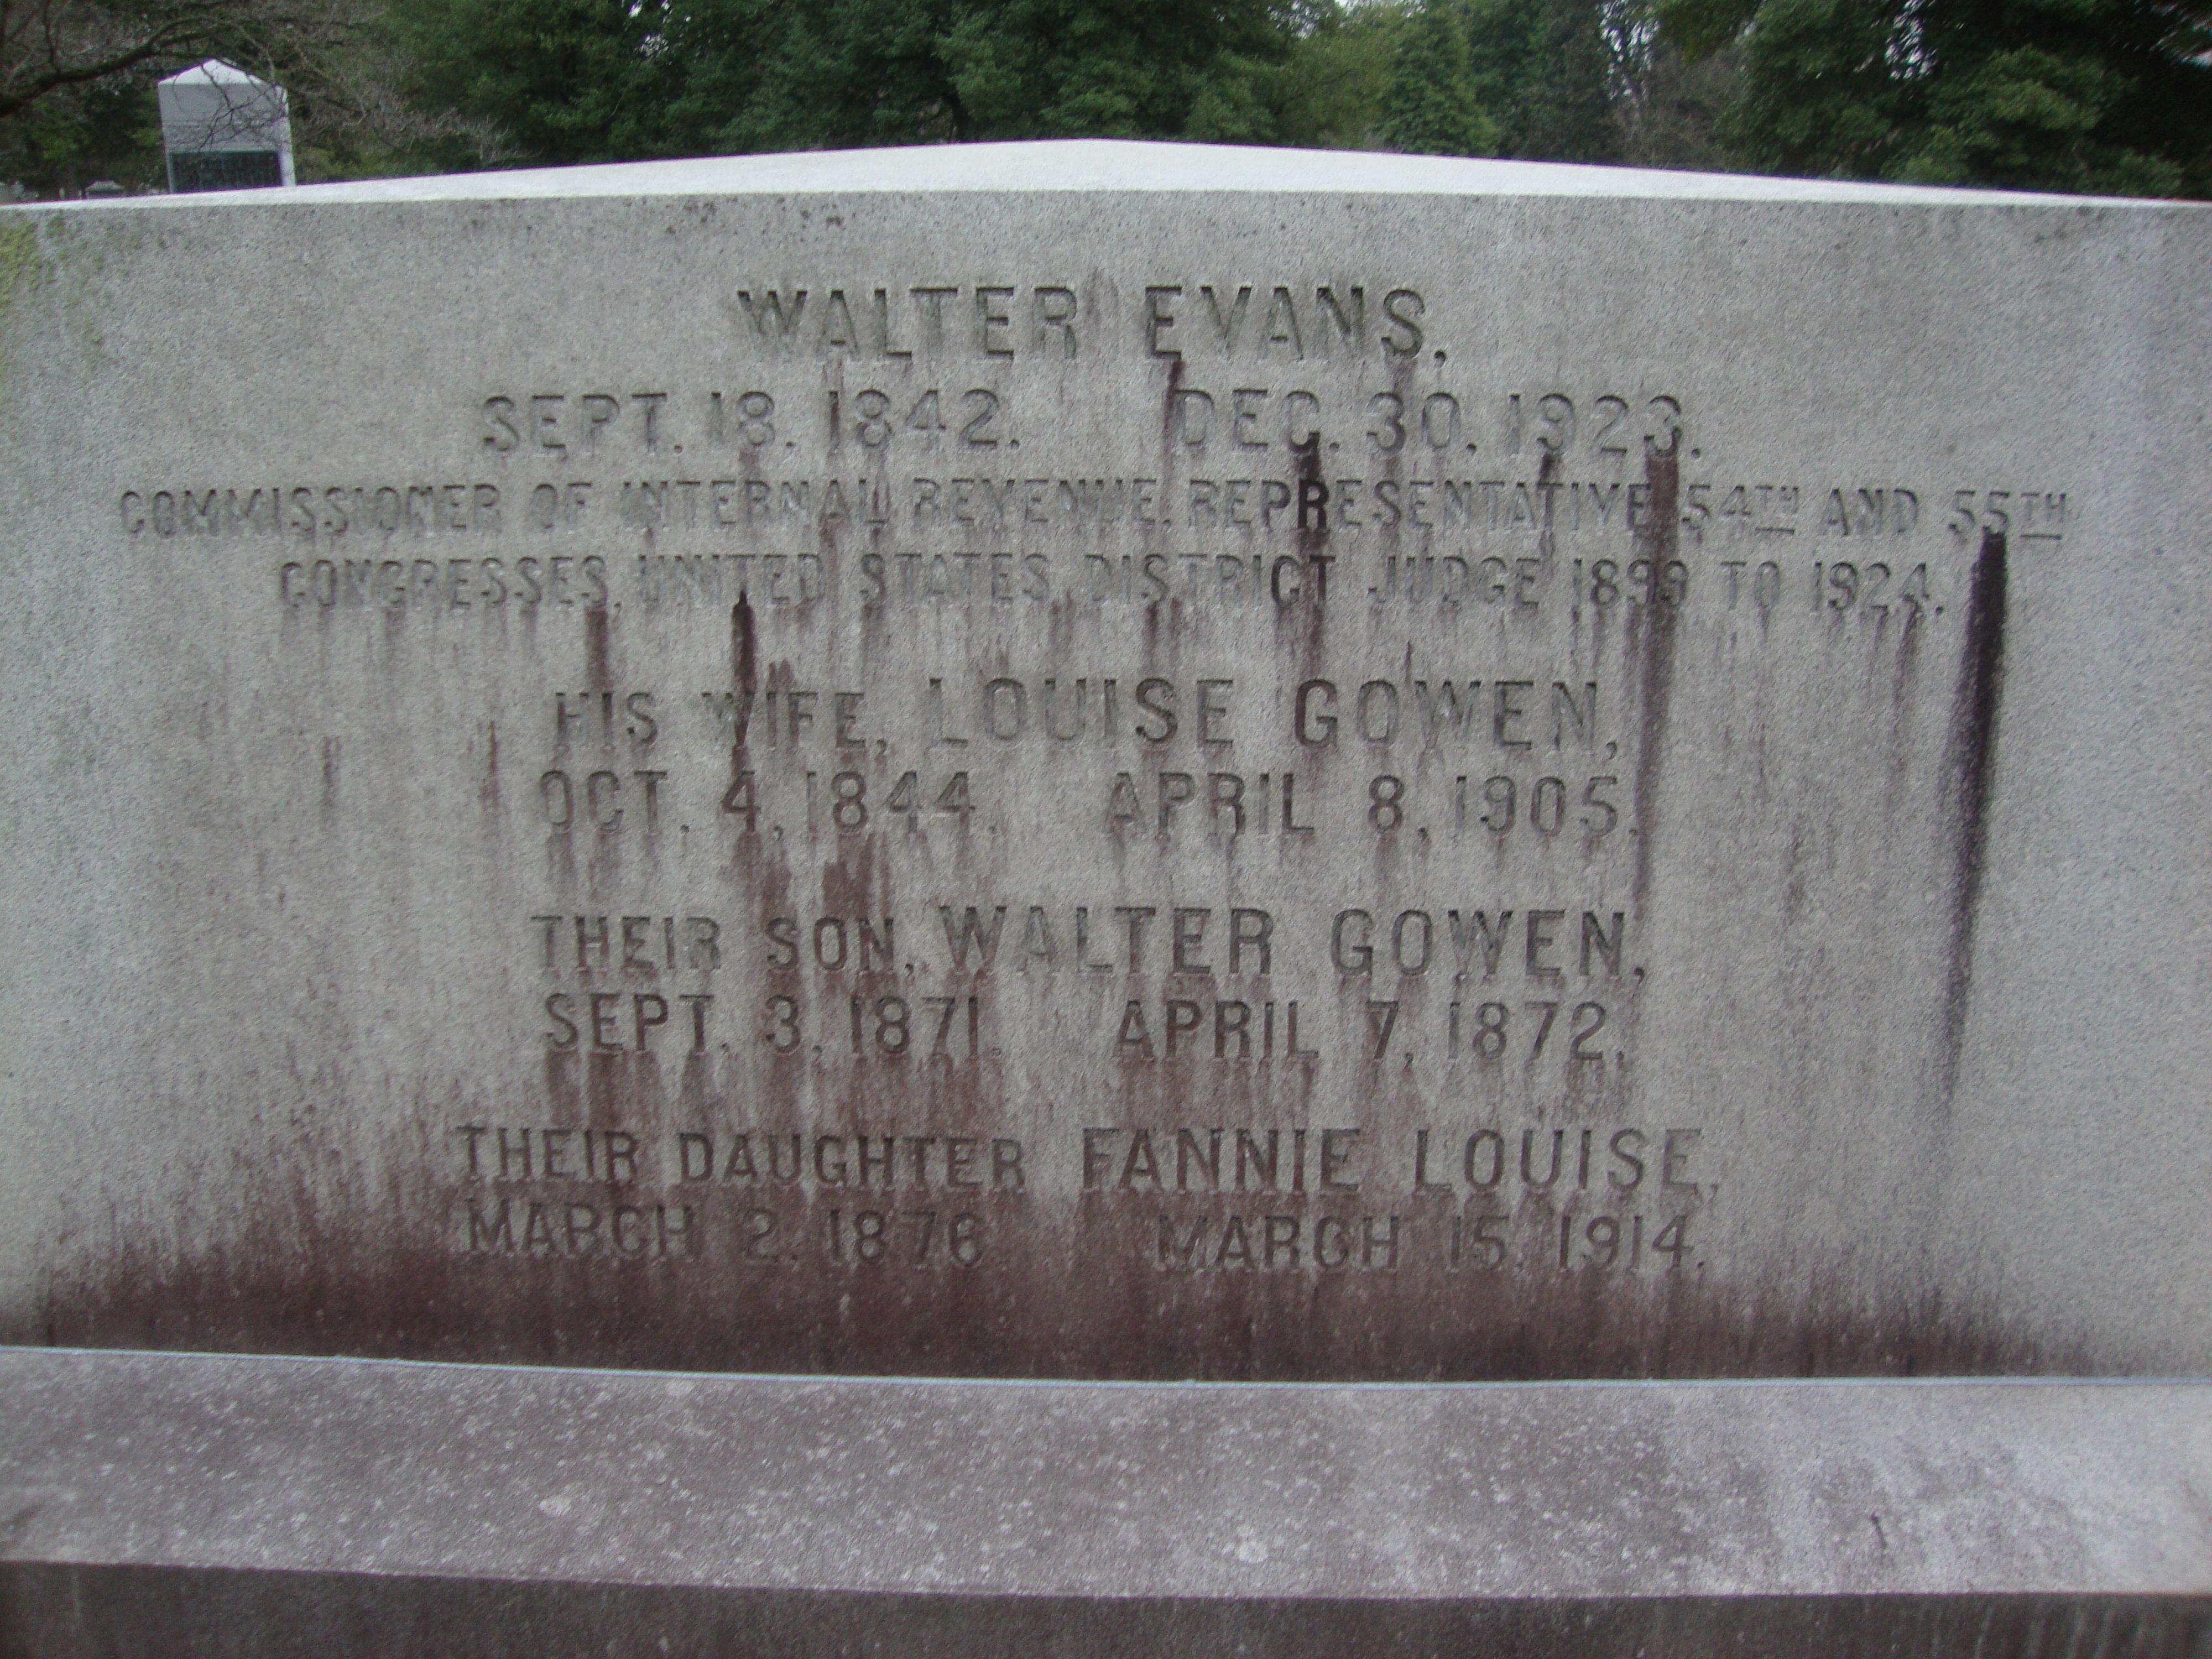 Judge Walter Evans